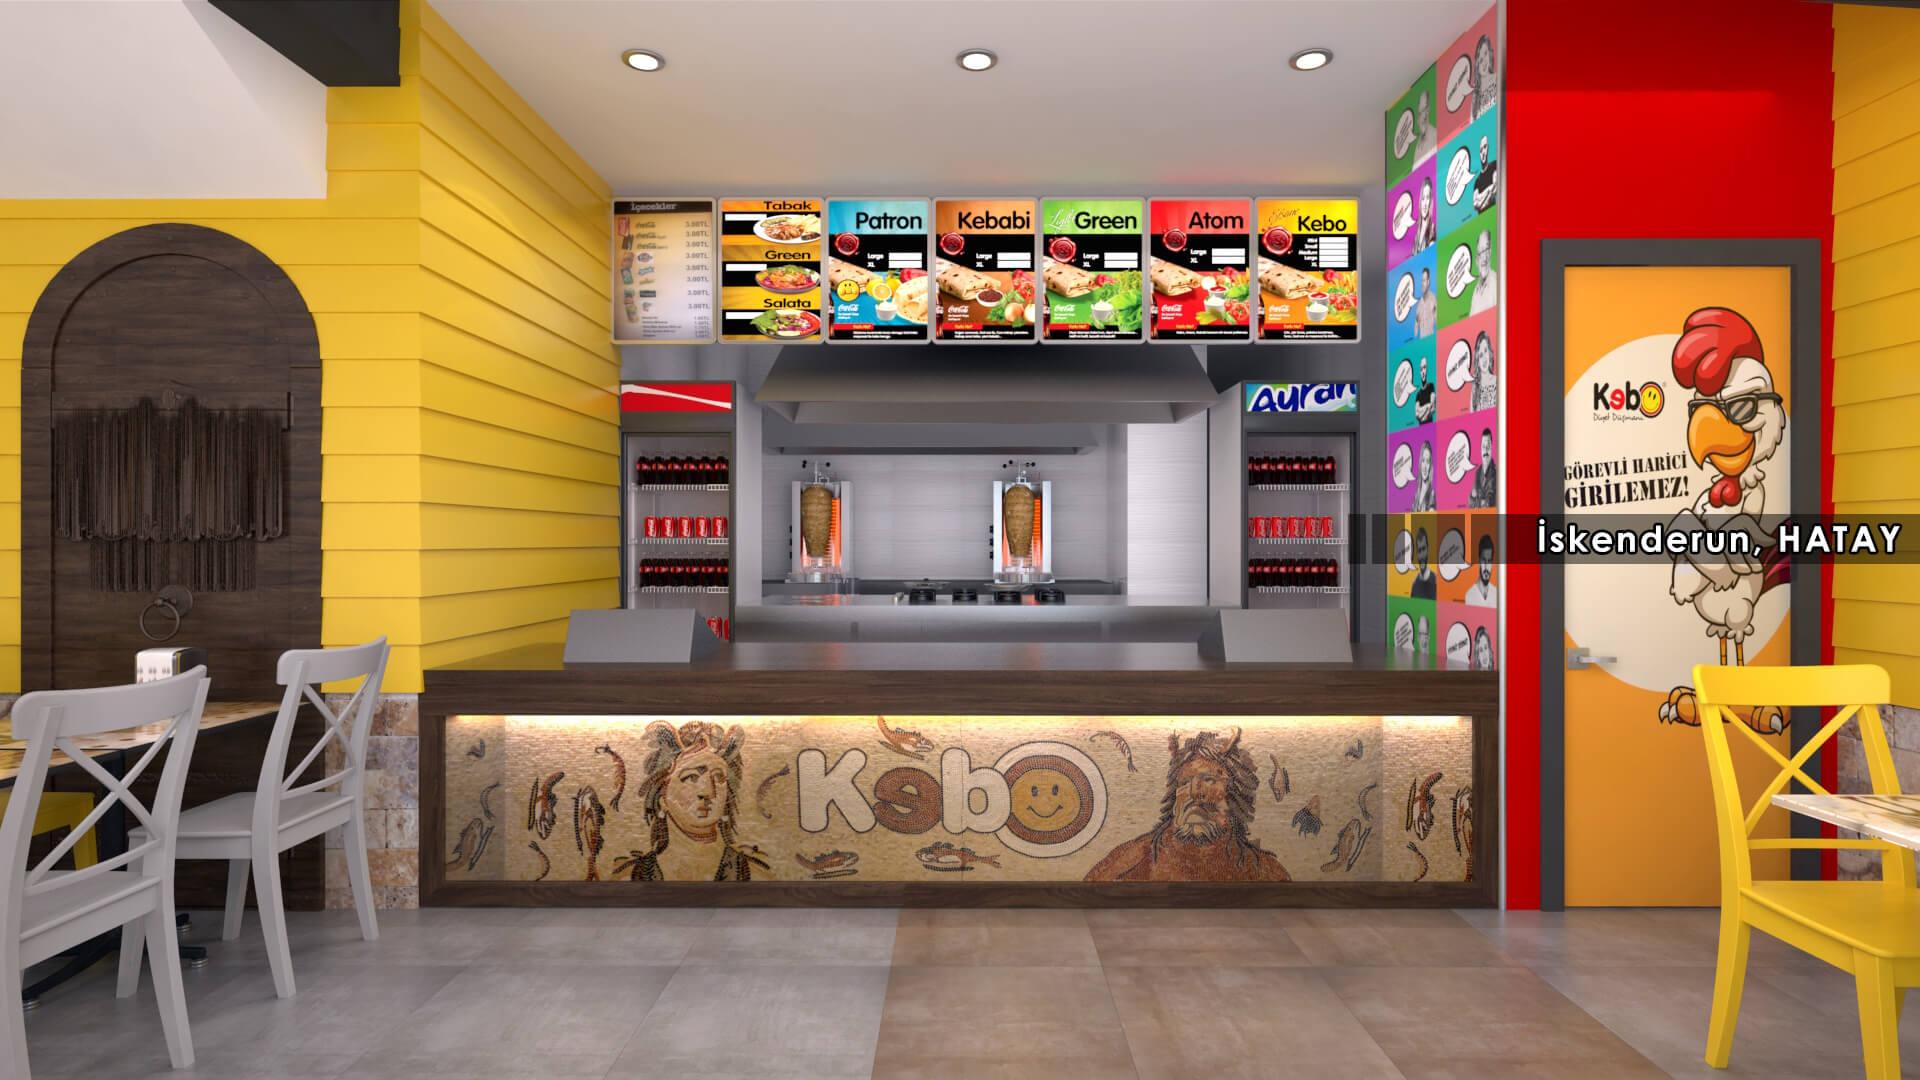 Restoran, Cafe, Fast-food Mimari Projeler Kebo 2017